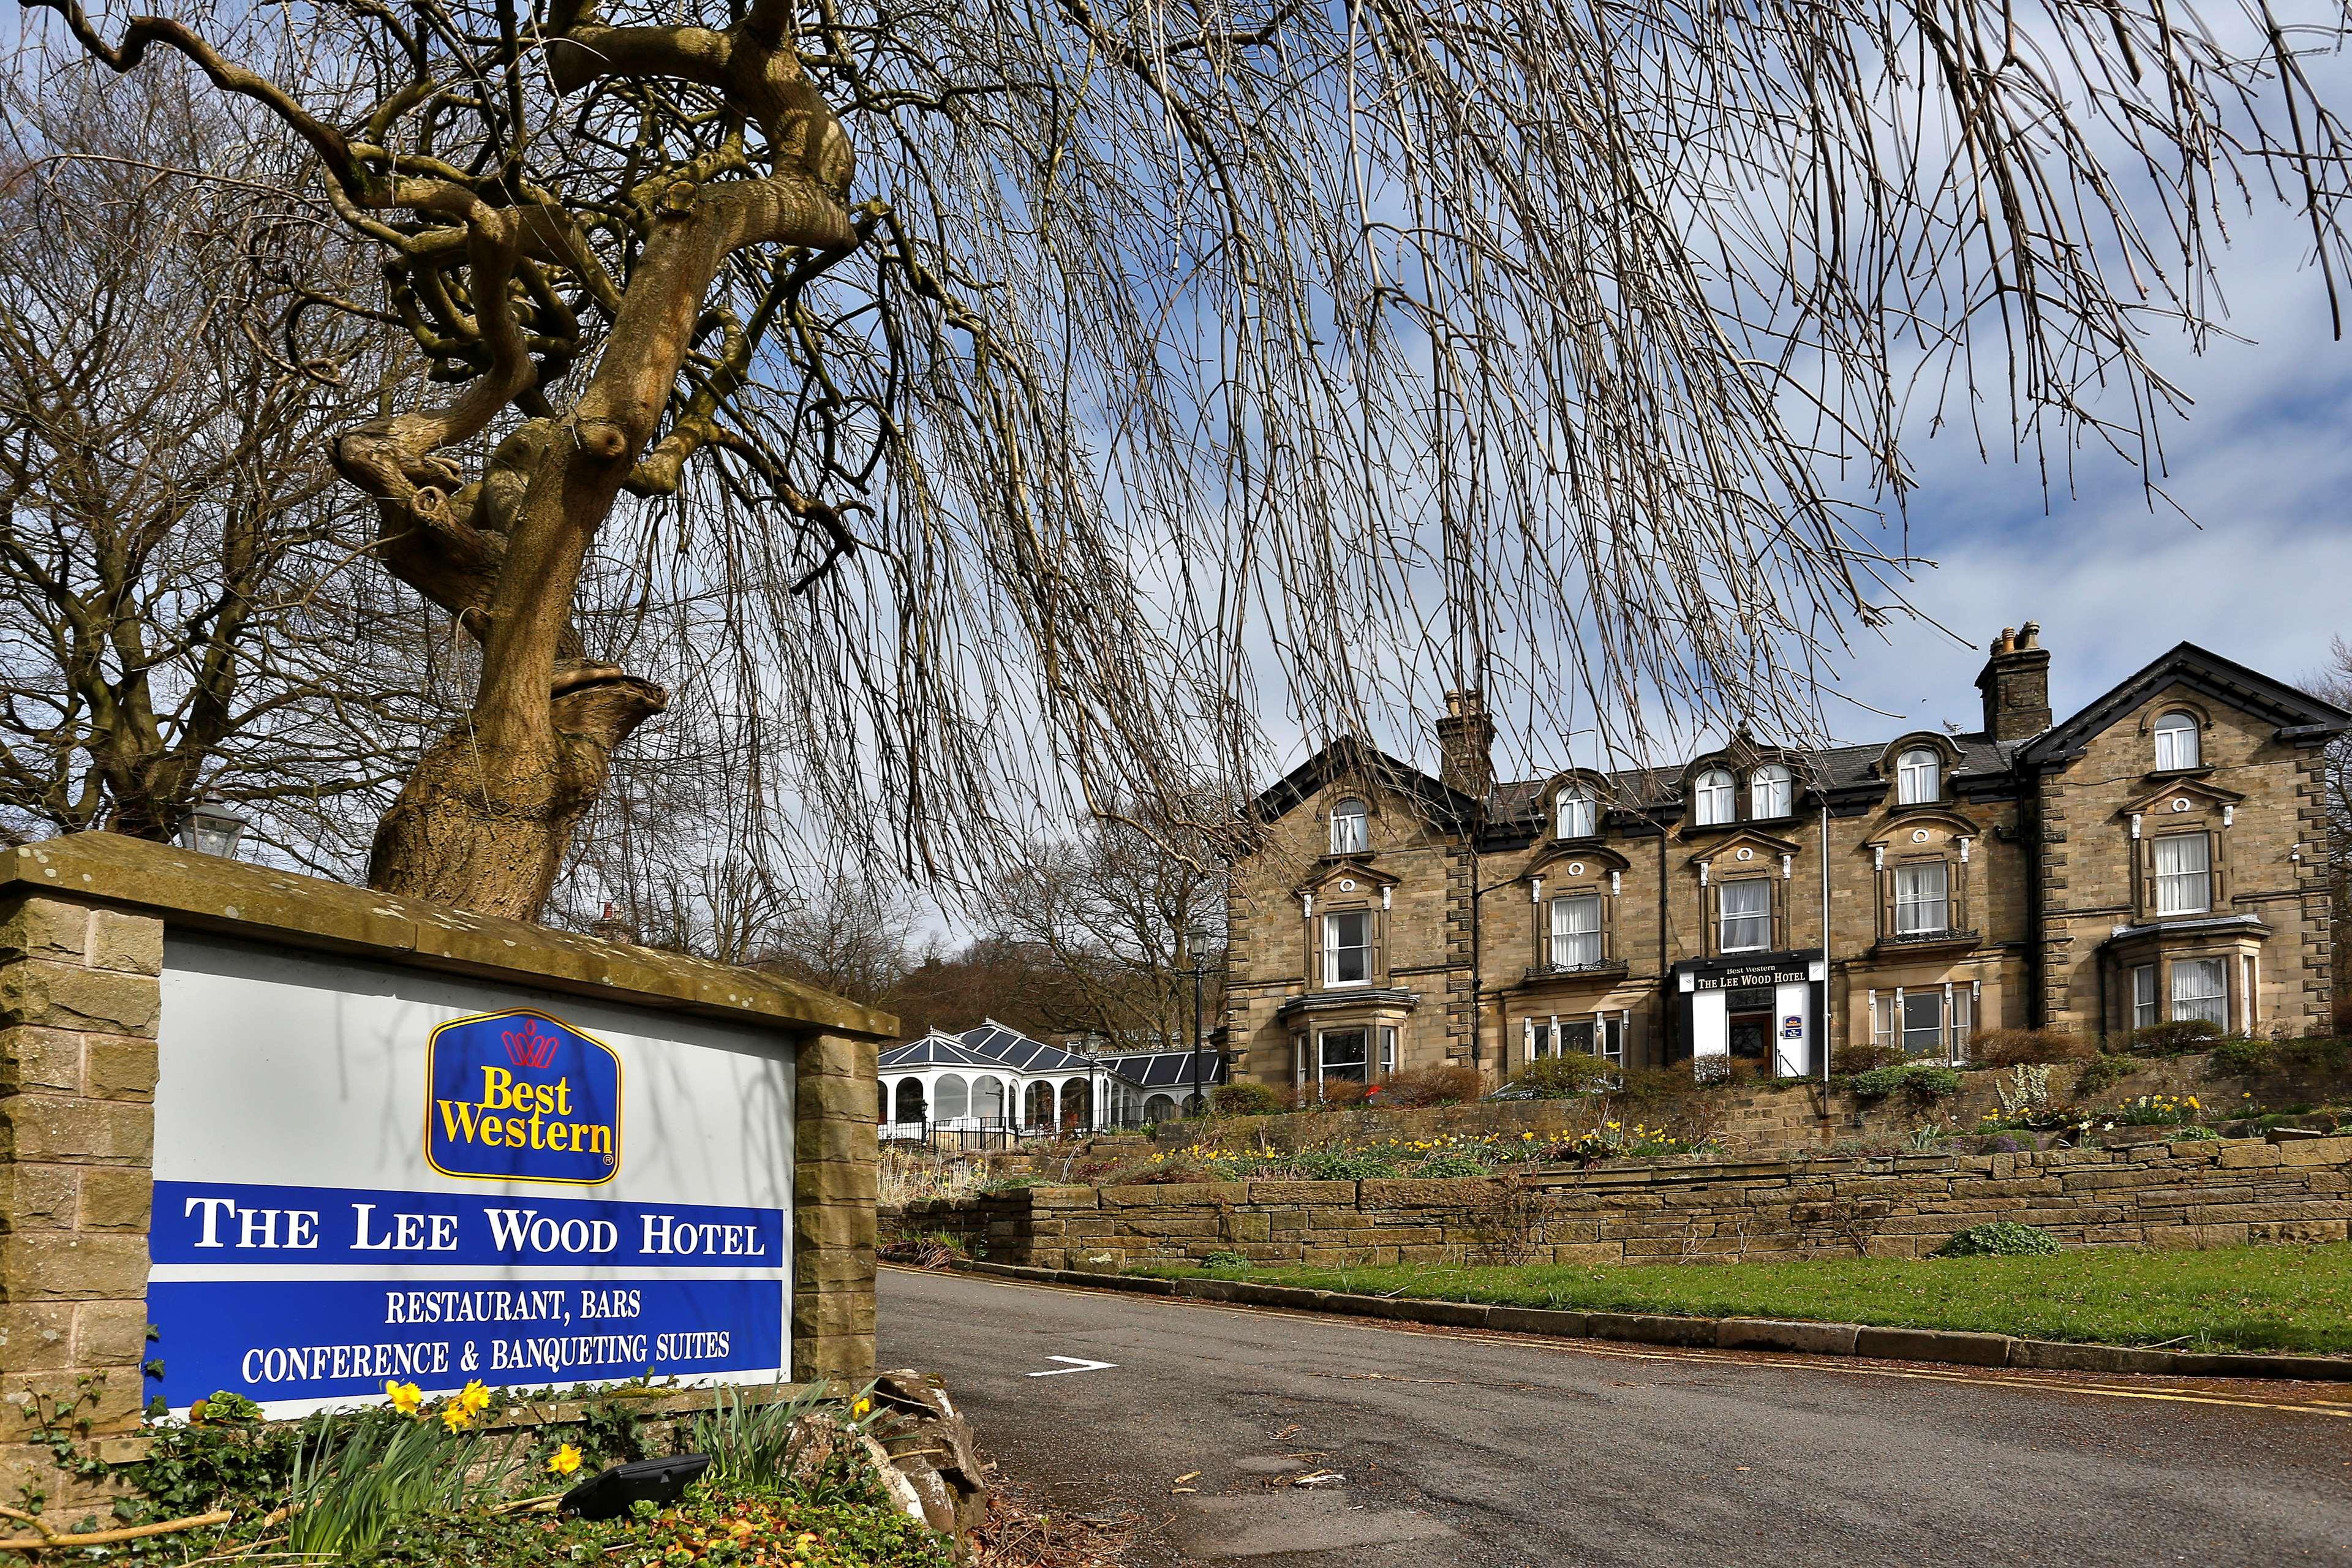 Best Western Hotel Buxton